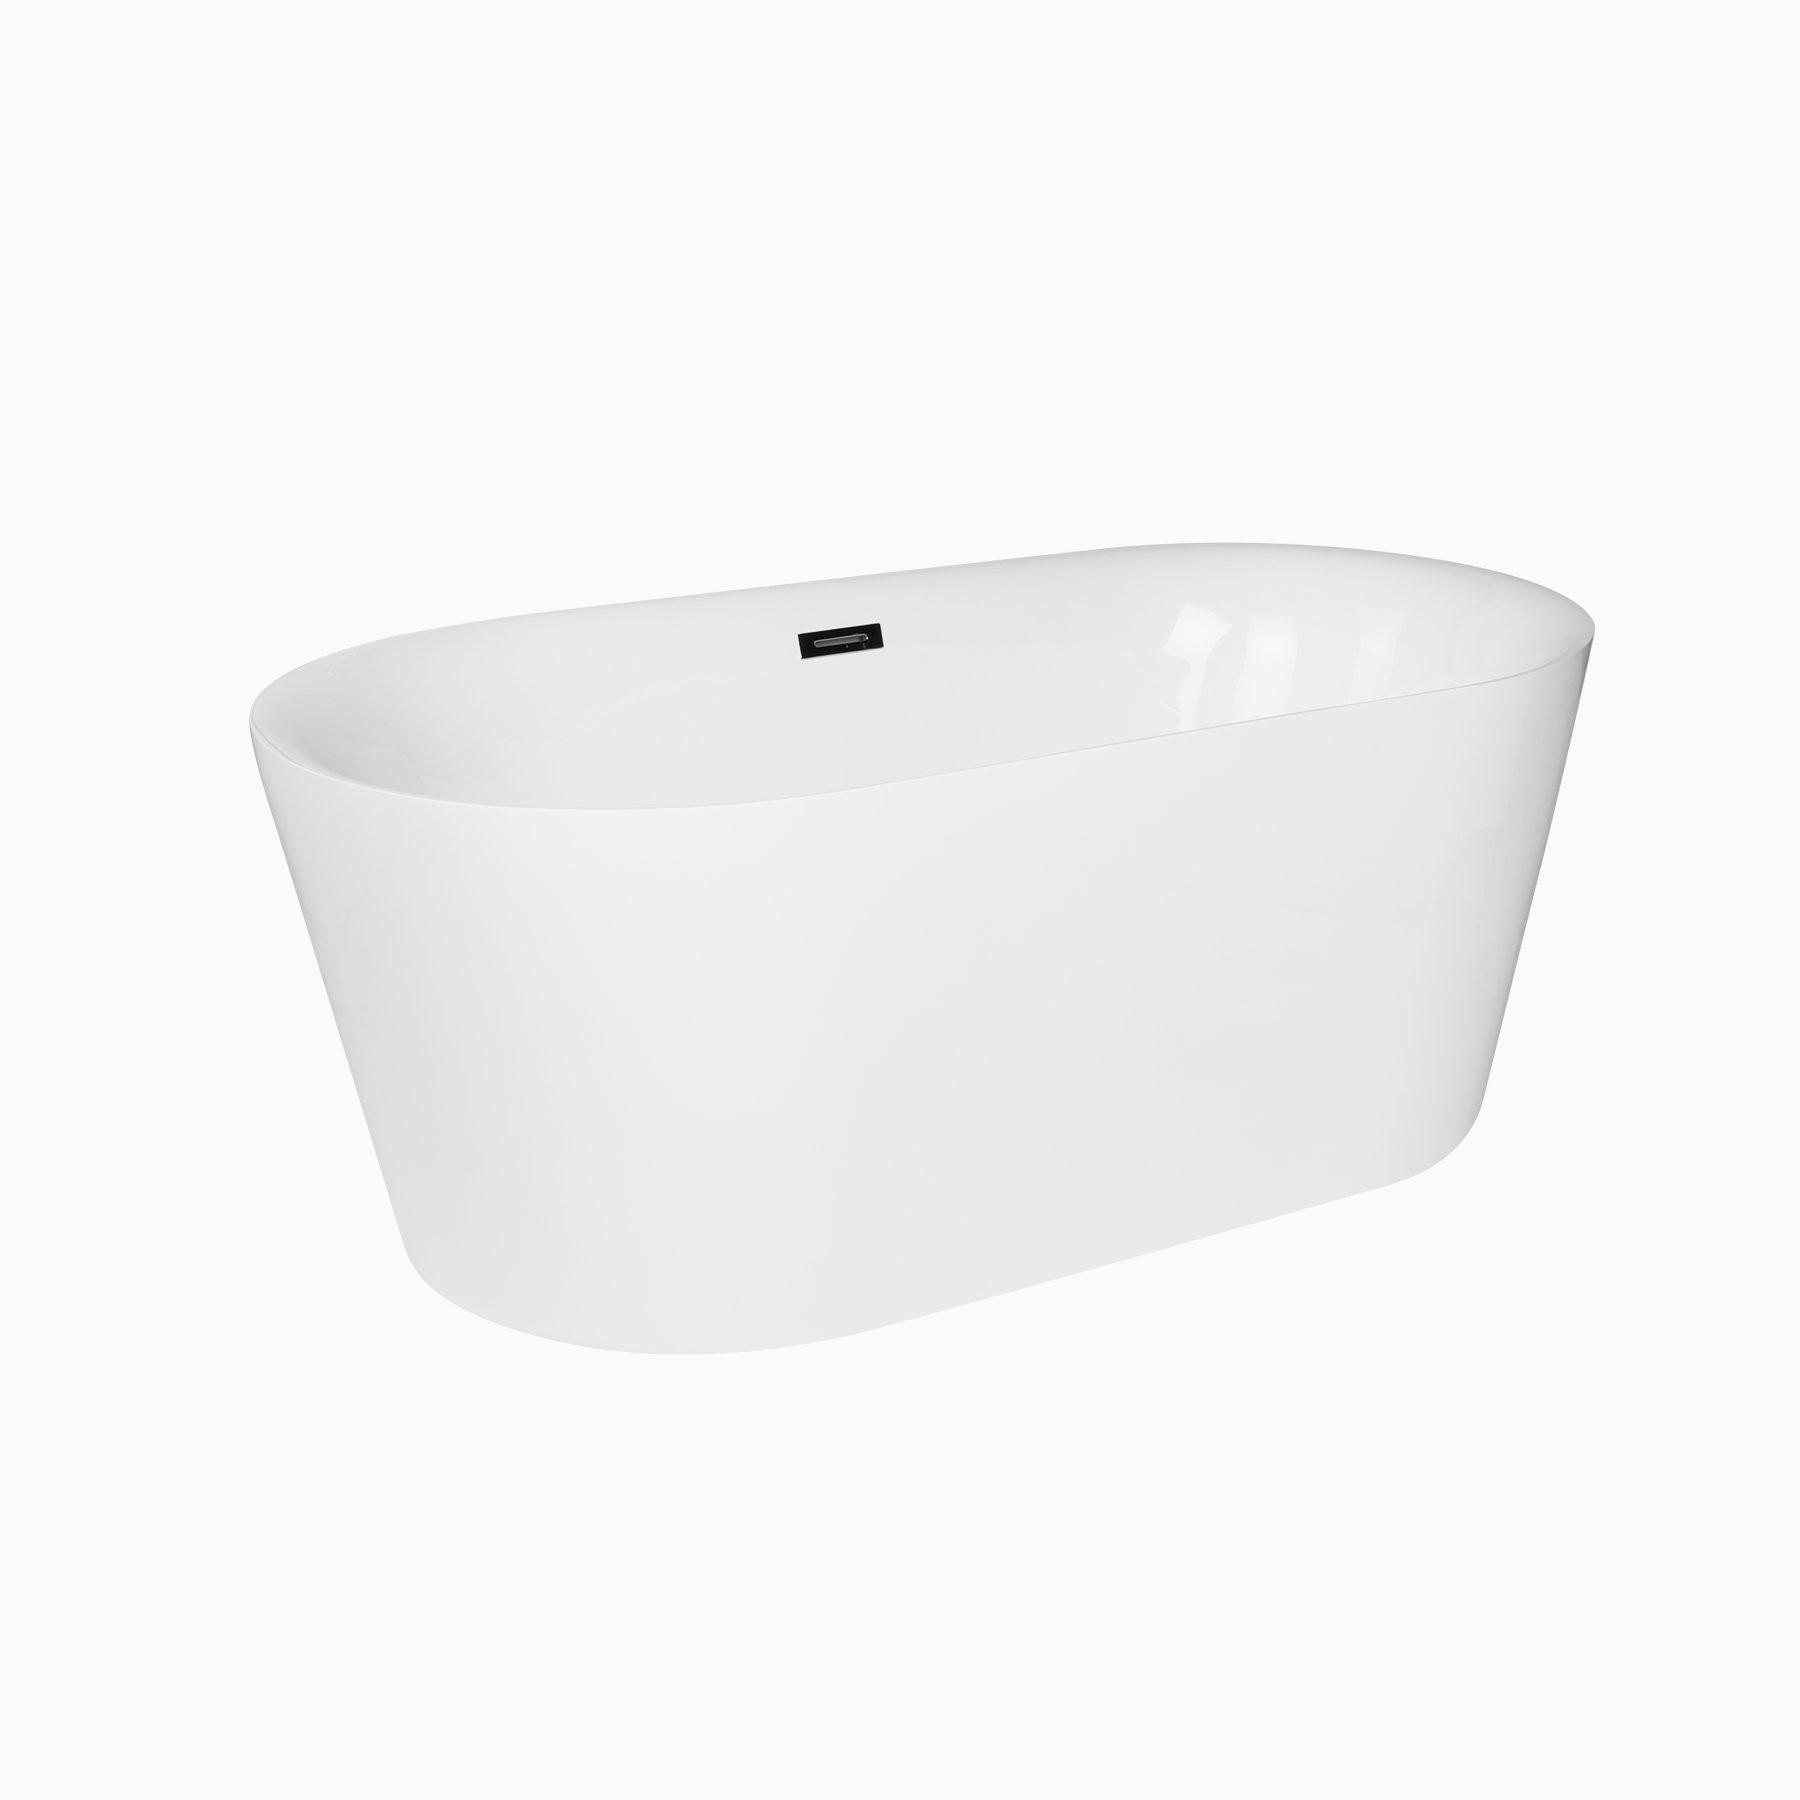 Bathtub materials comparison 28 images bathtub for Bathtub material comparison